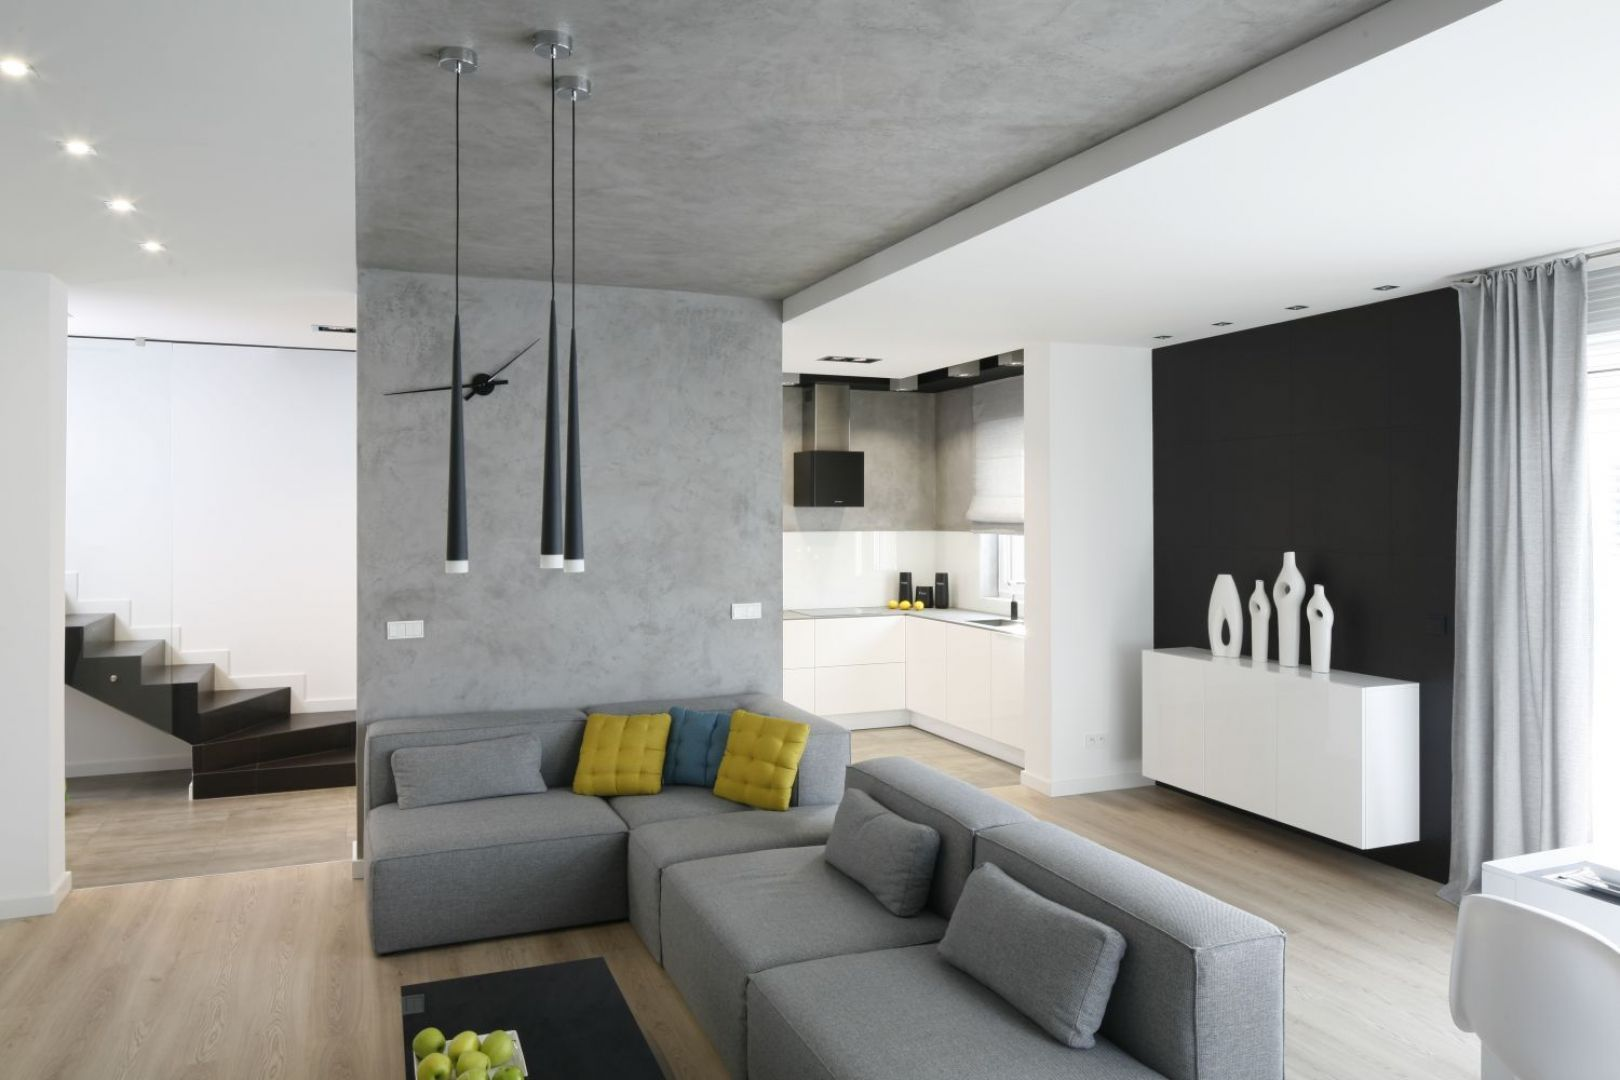 Pin Na Oświetlenie W Saloniebeautiful Living Room Lighting